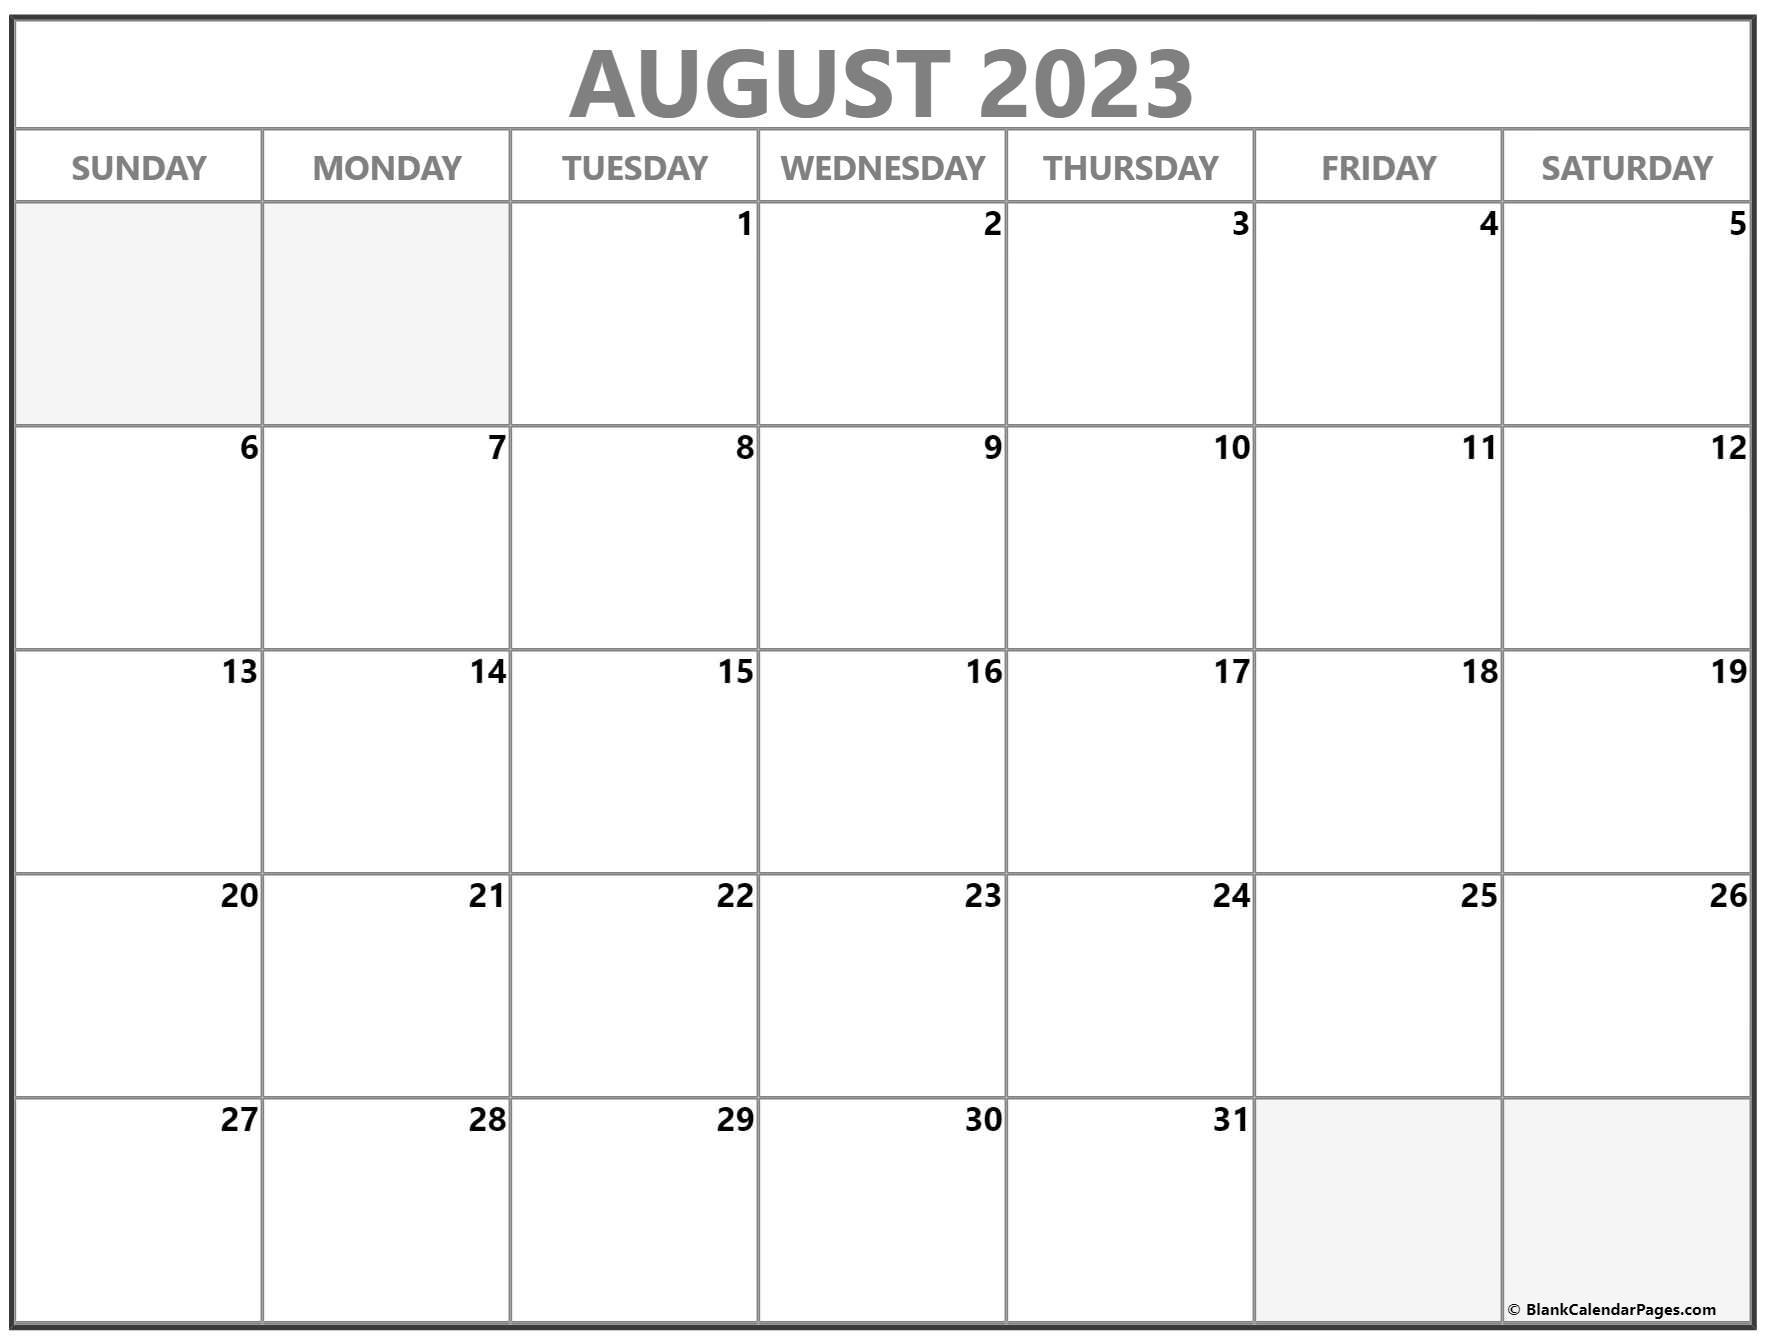 August 2022 calendar | free printable calendar templates